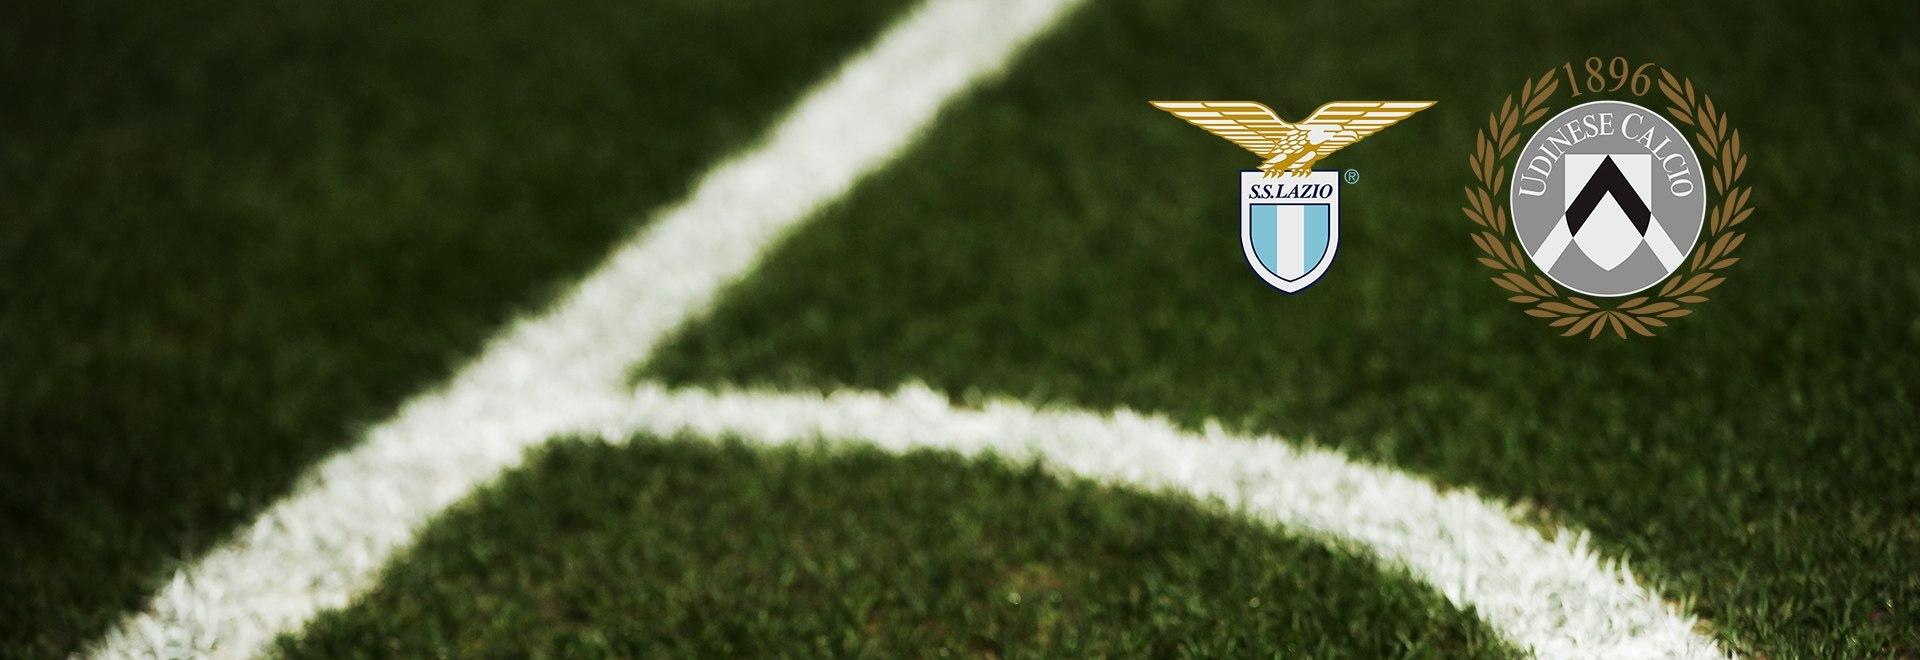 Lazio - Udinese. 14a g.